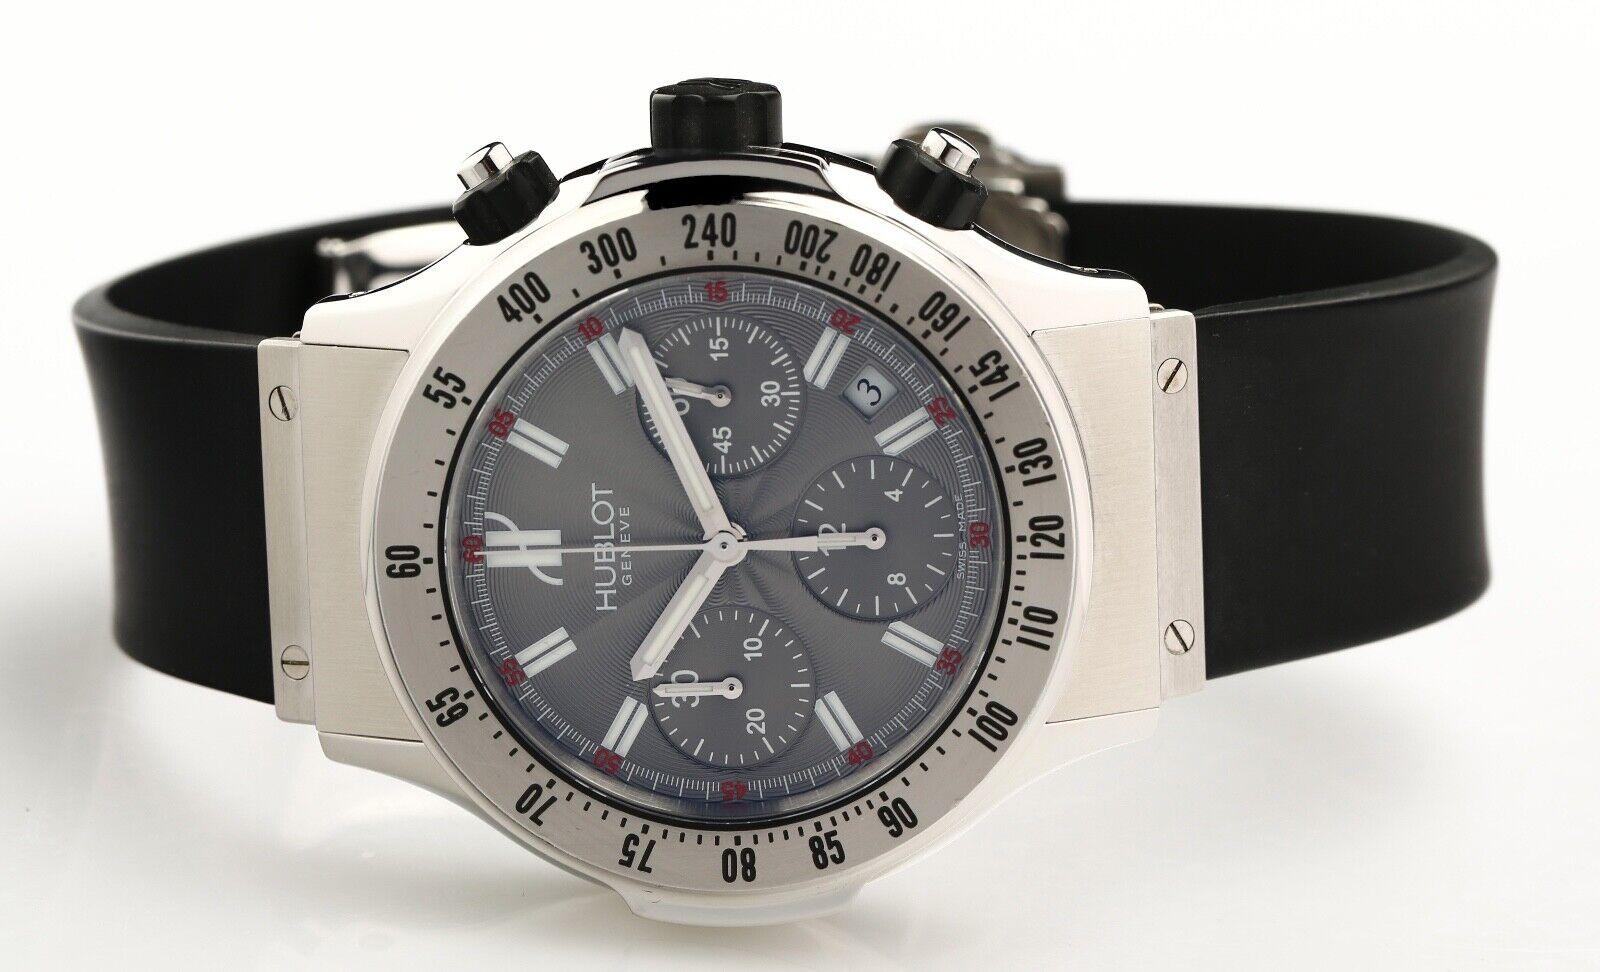 HUBLOT MDM Super B Ref# 1921.1 Automatic Chronograph Wristwatch - watch picture 1